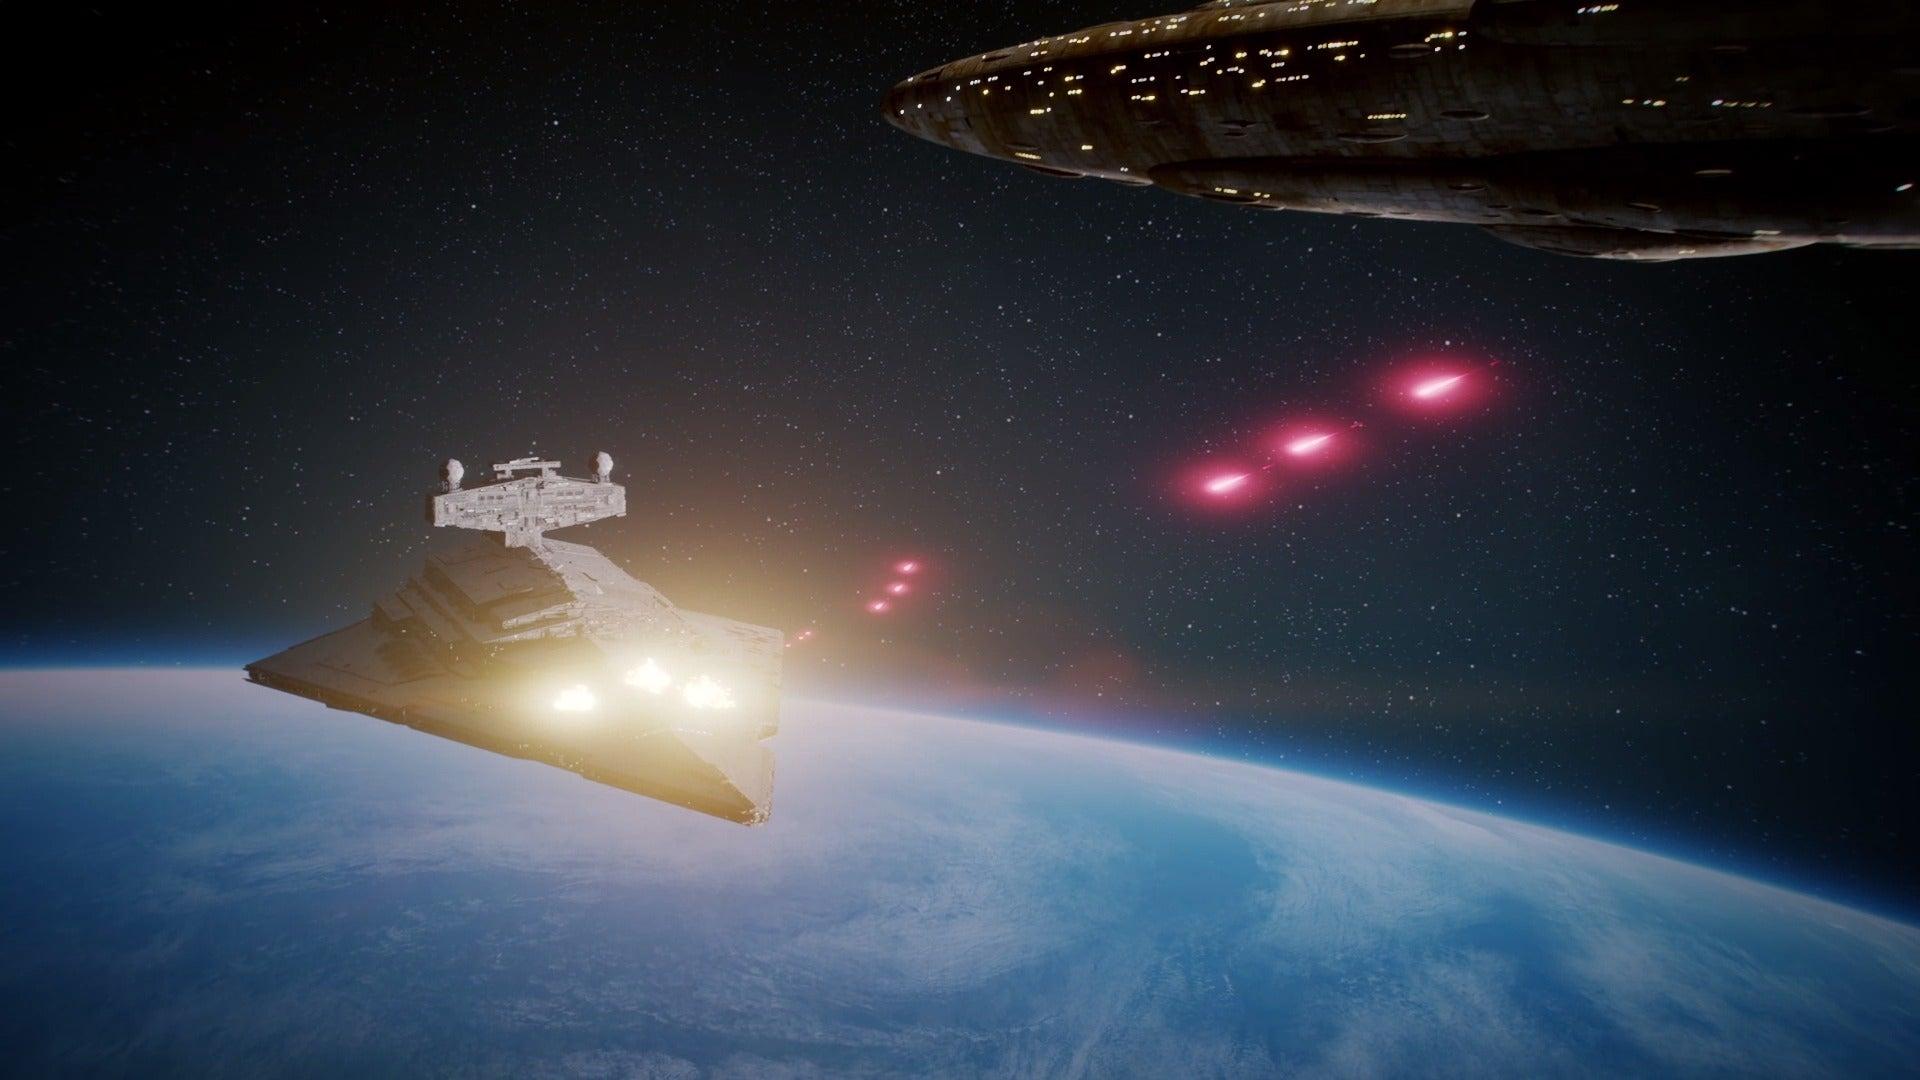 Star Wars Battlefront Ii Review The Dark Side Pcworld